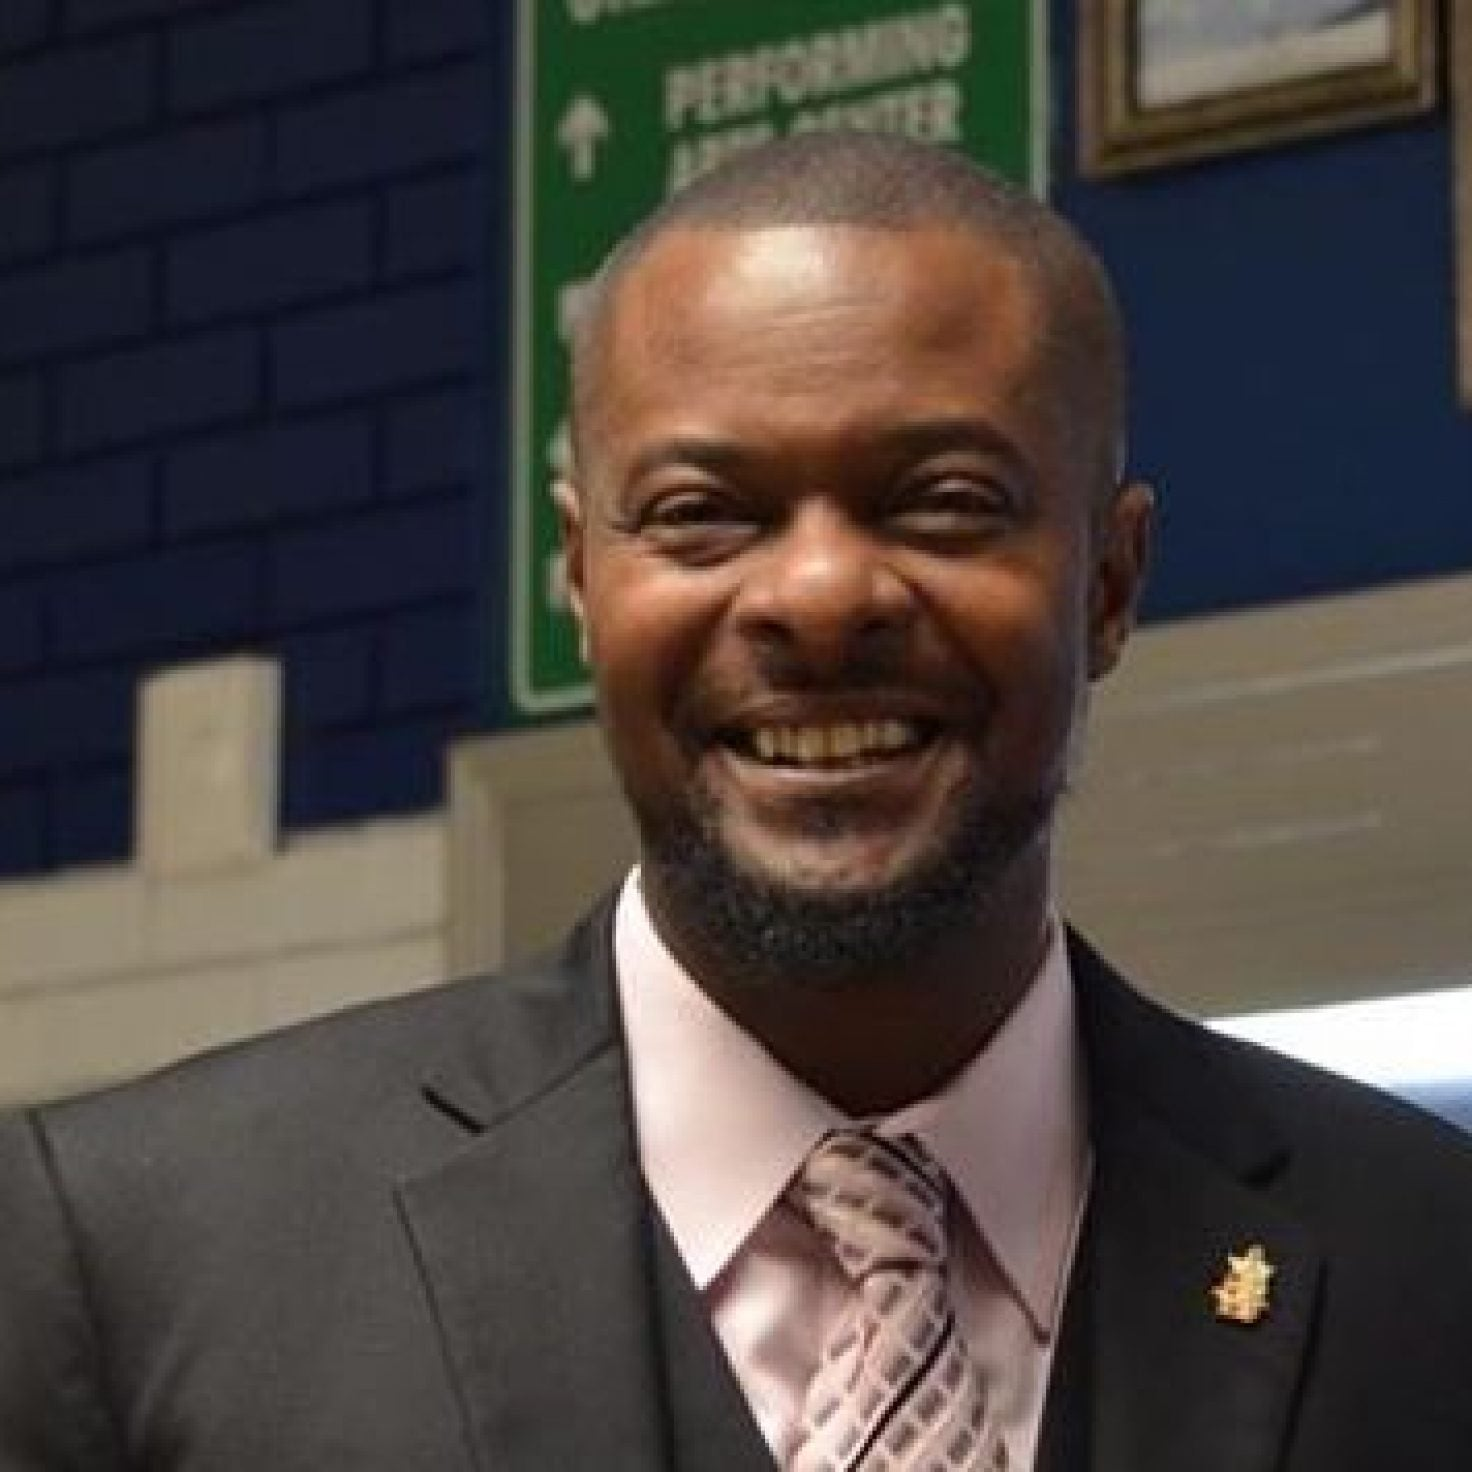 North Carolina Principal Visited All 220 Seniors To Celebrate Graduation